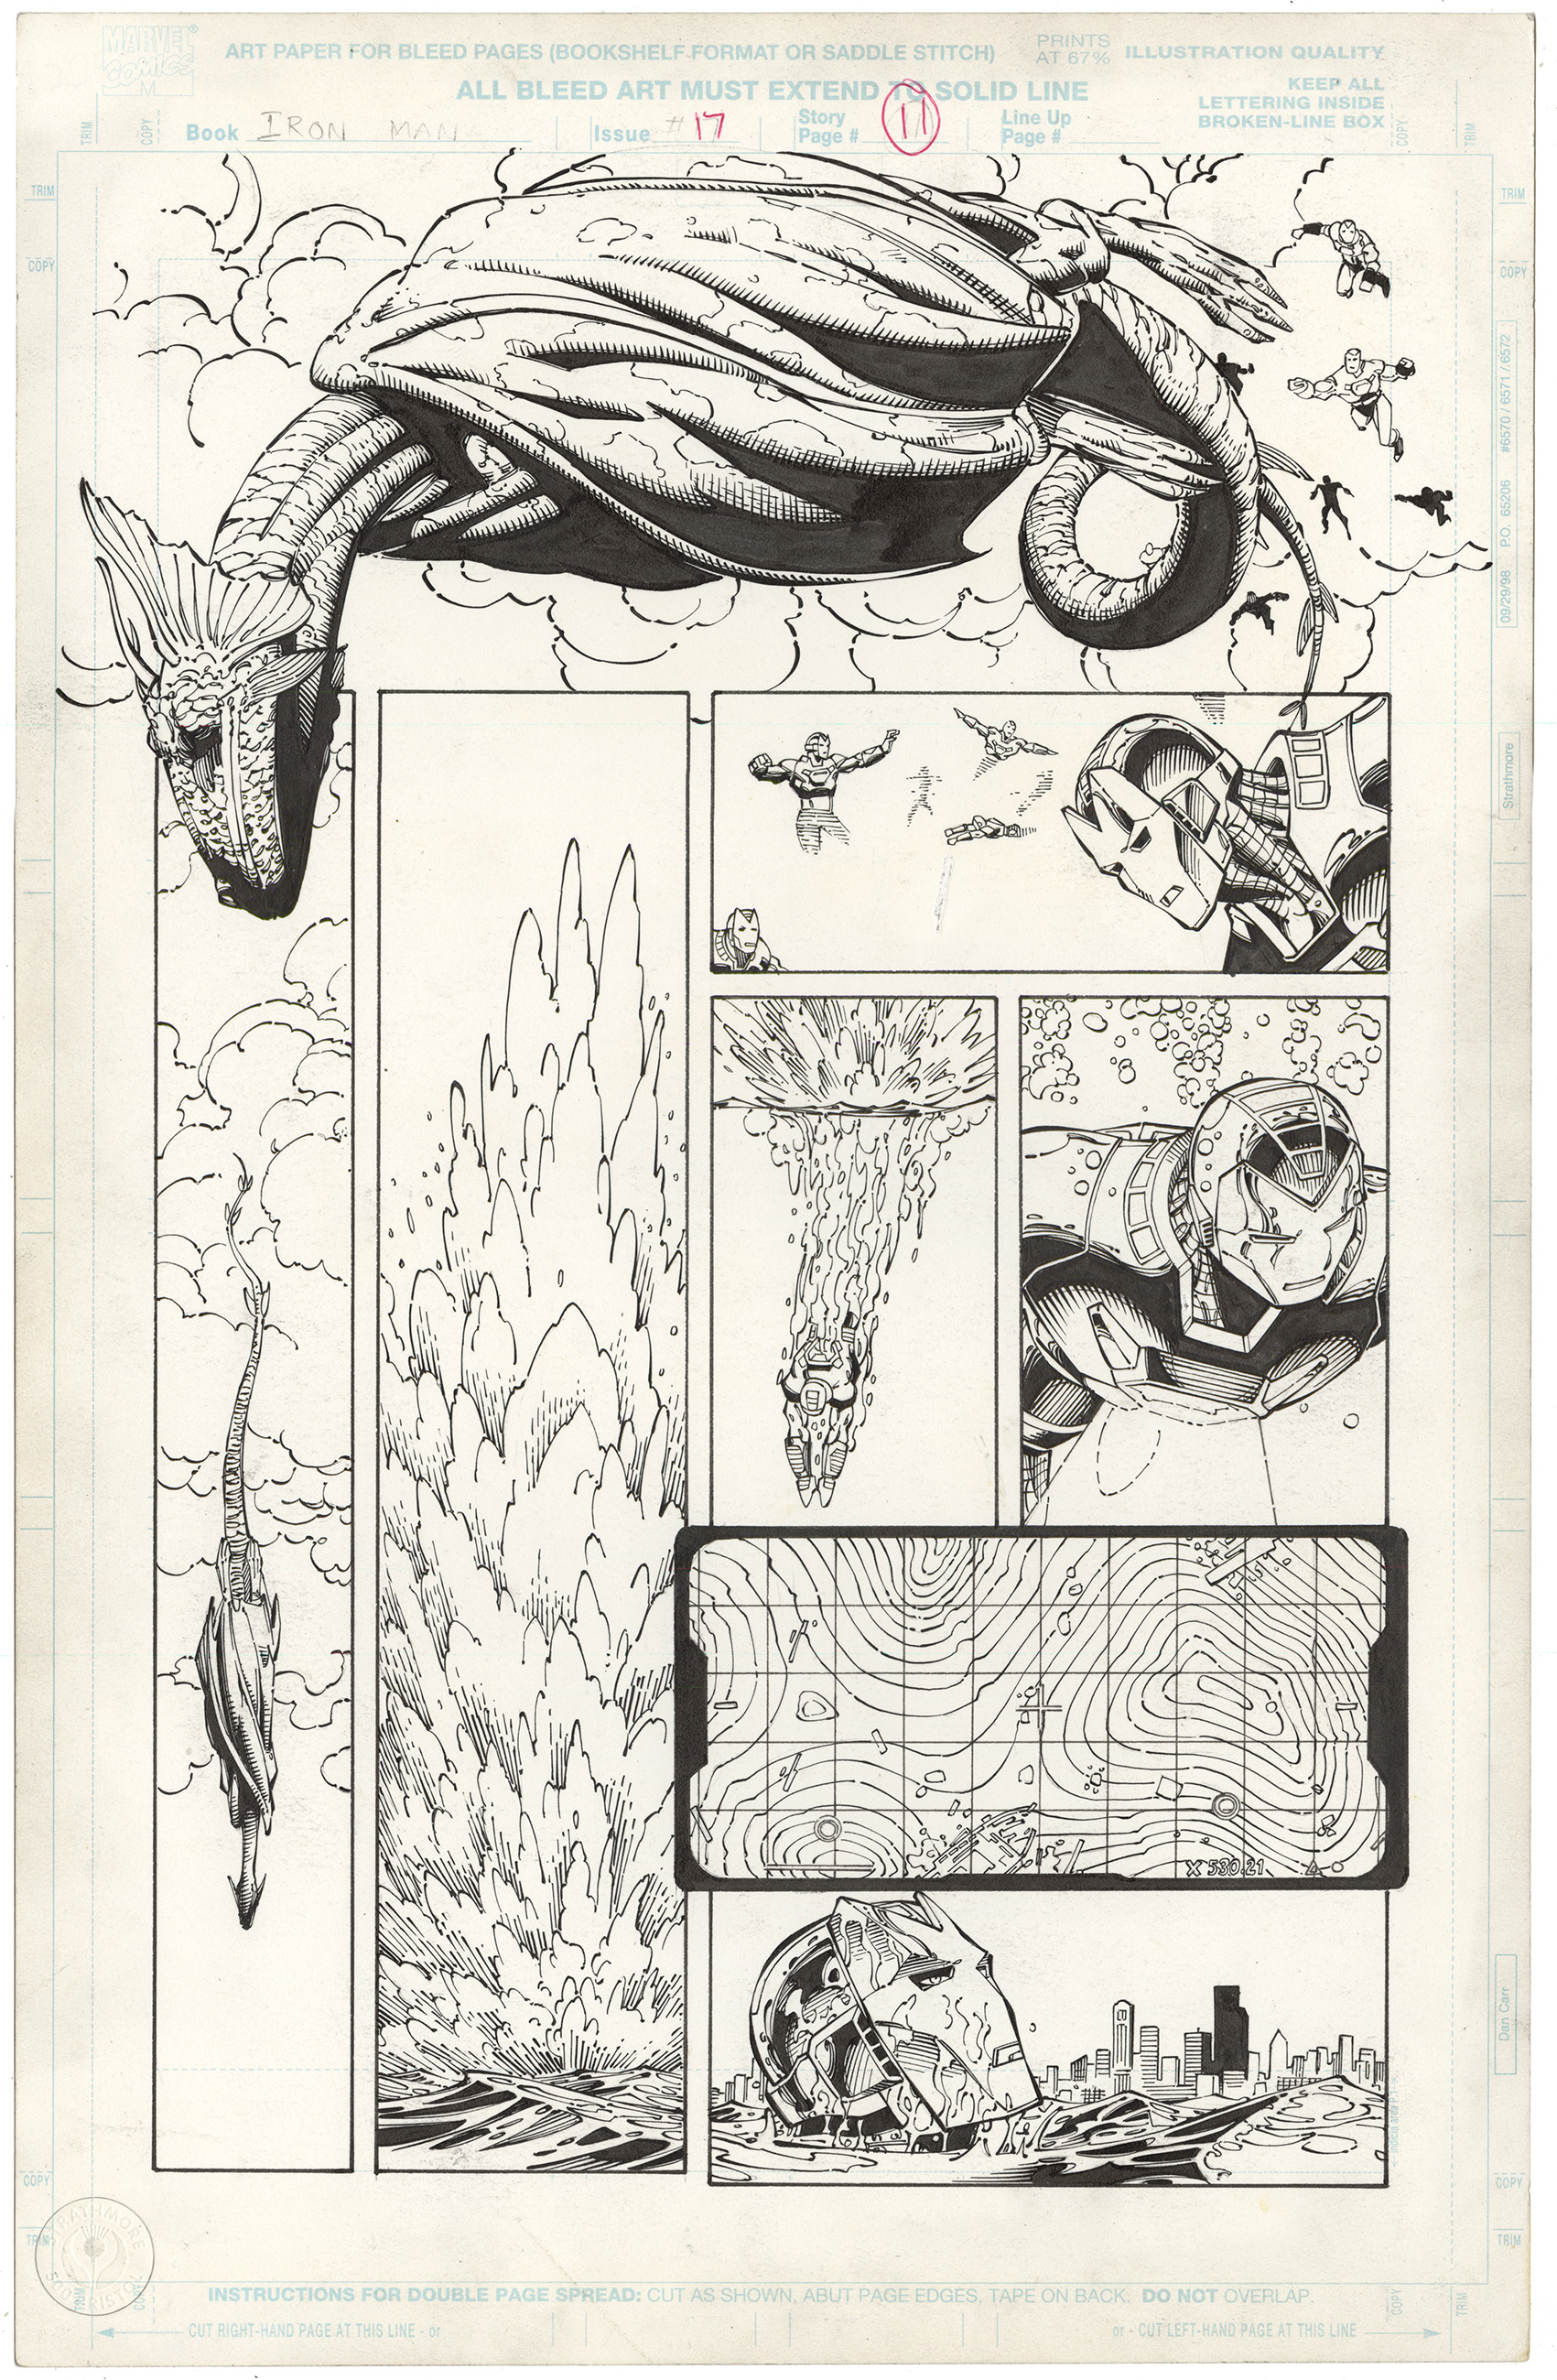 Iron Man, Vol 3 #17 p11 (Fin Fang Foom)